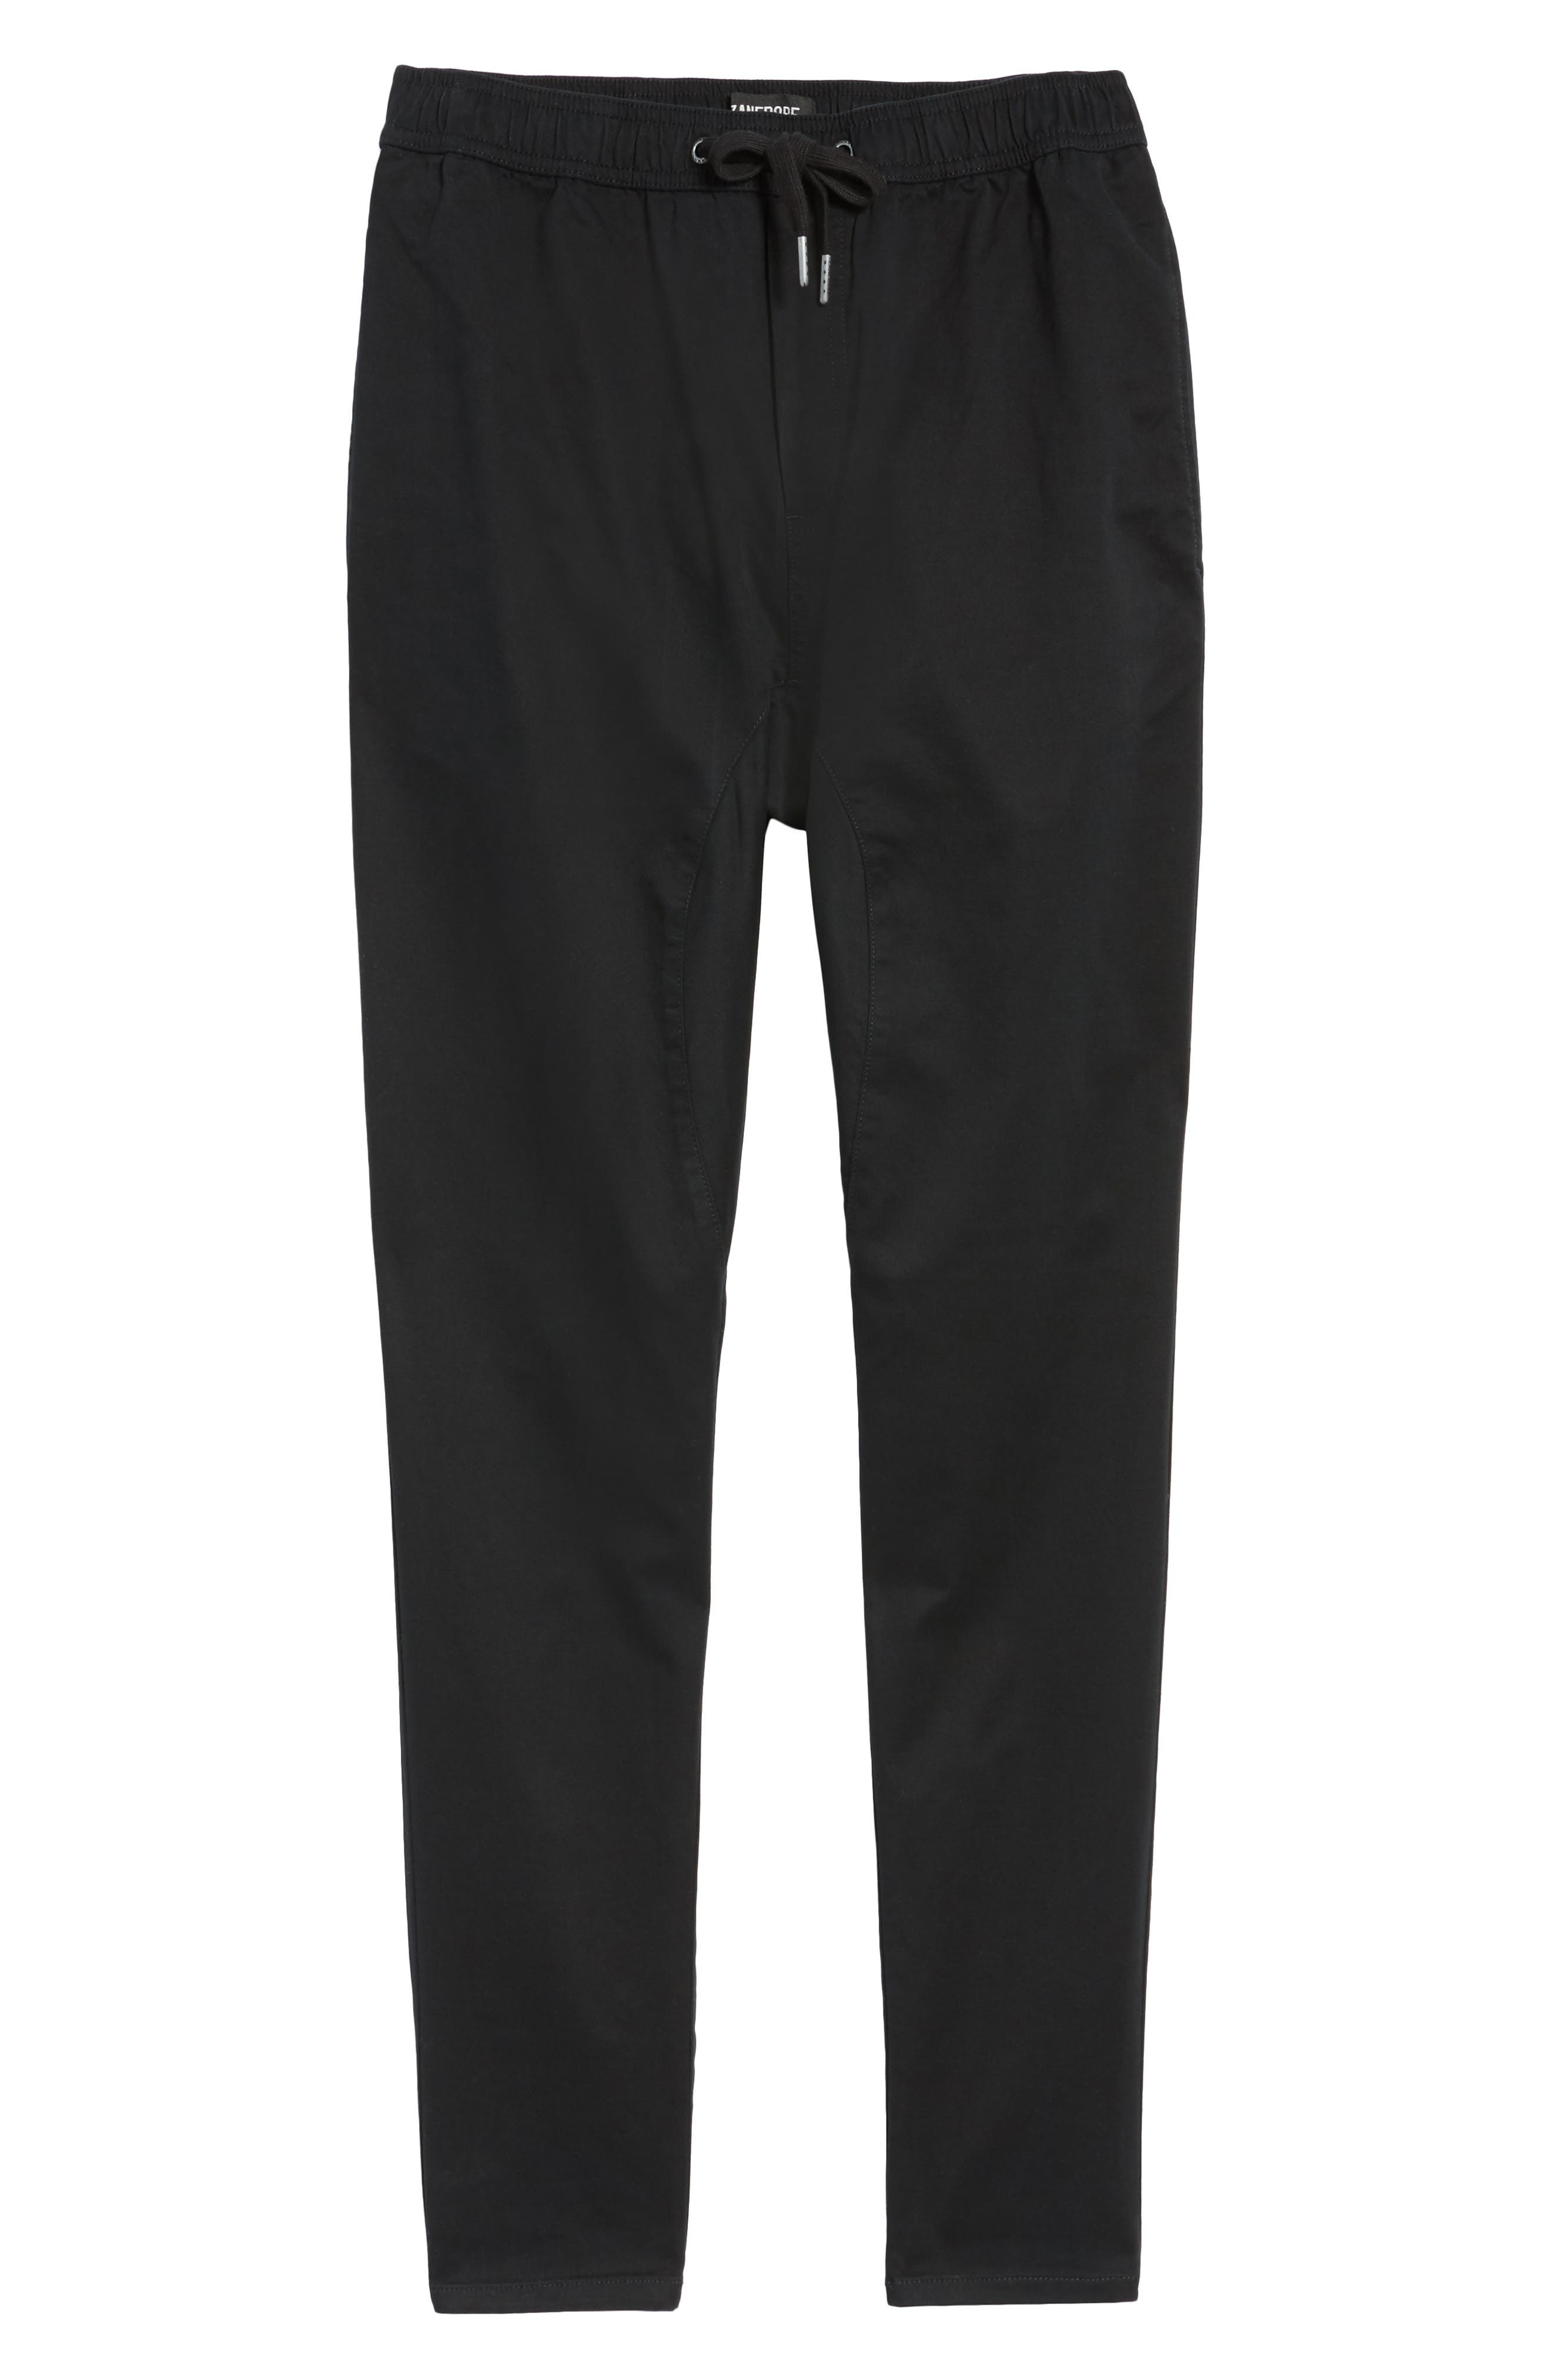 Men's Zanerobe Salerno Stretch Woven Jogger Pants